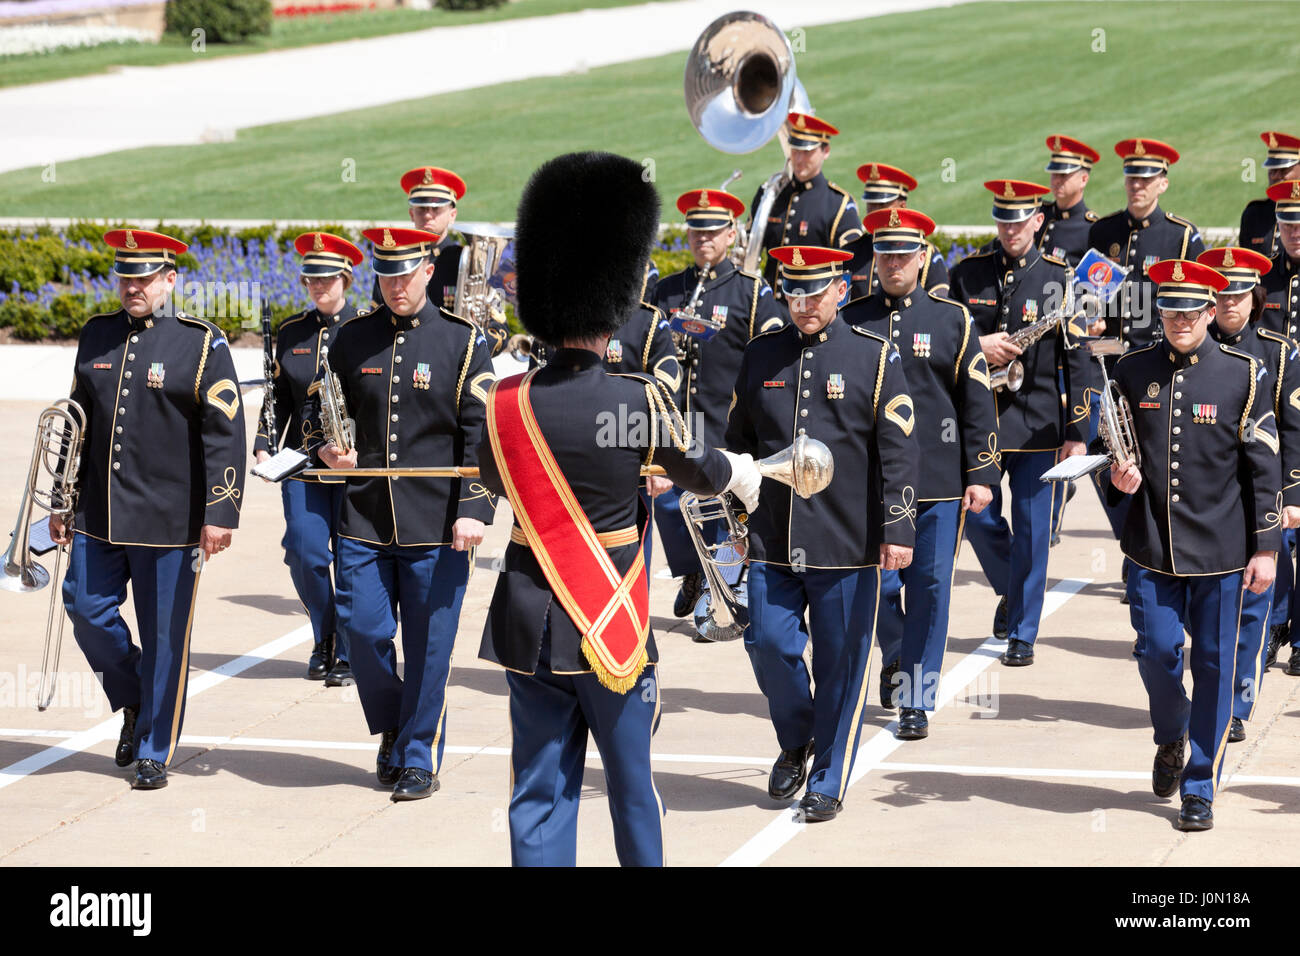 US Air Force (USAF) Band performs at the Pentagon - Washington, DC USA - Stock Image